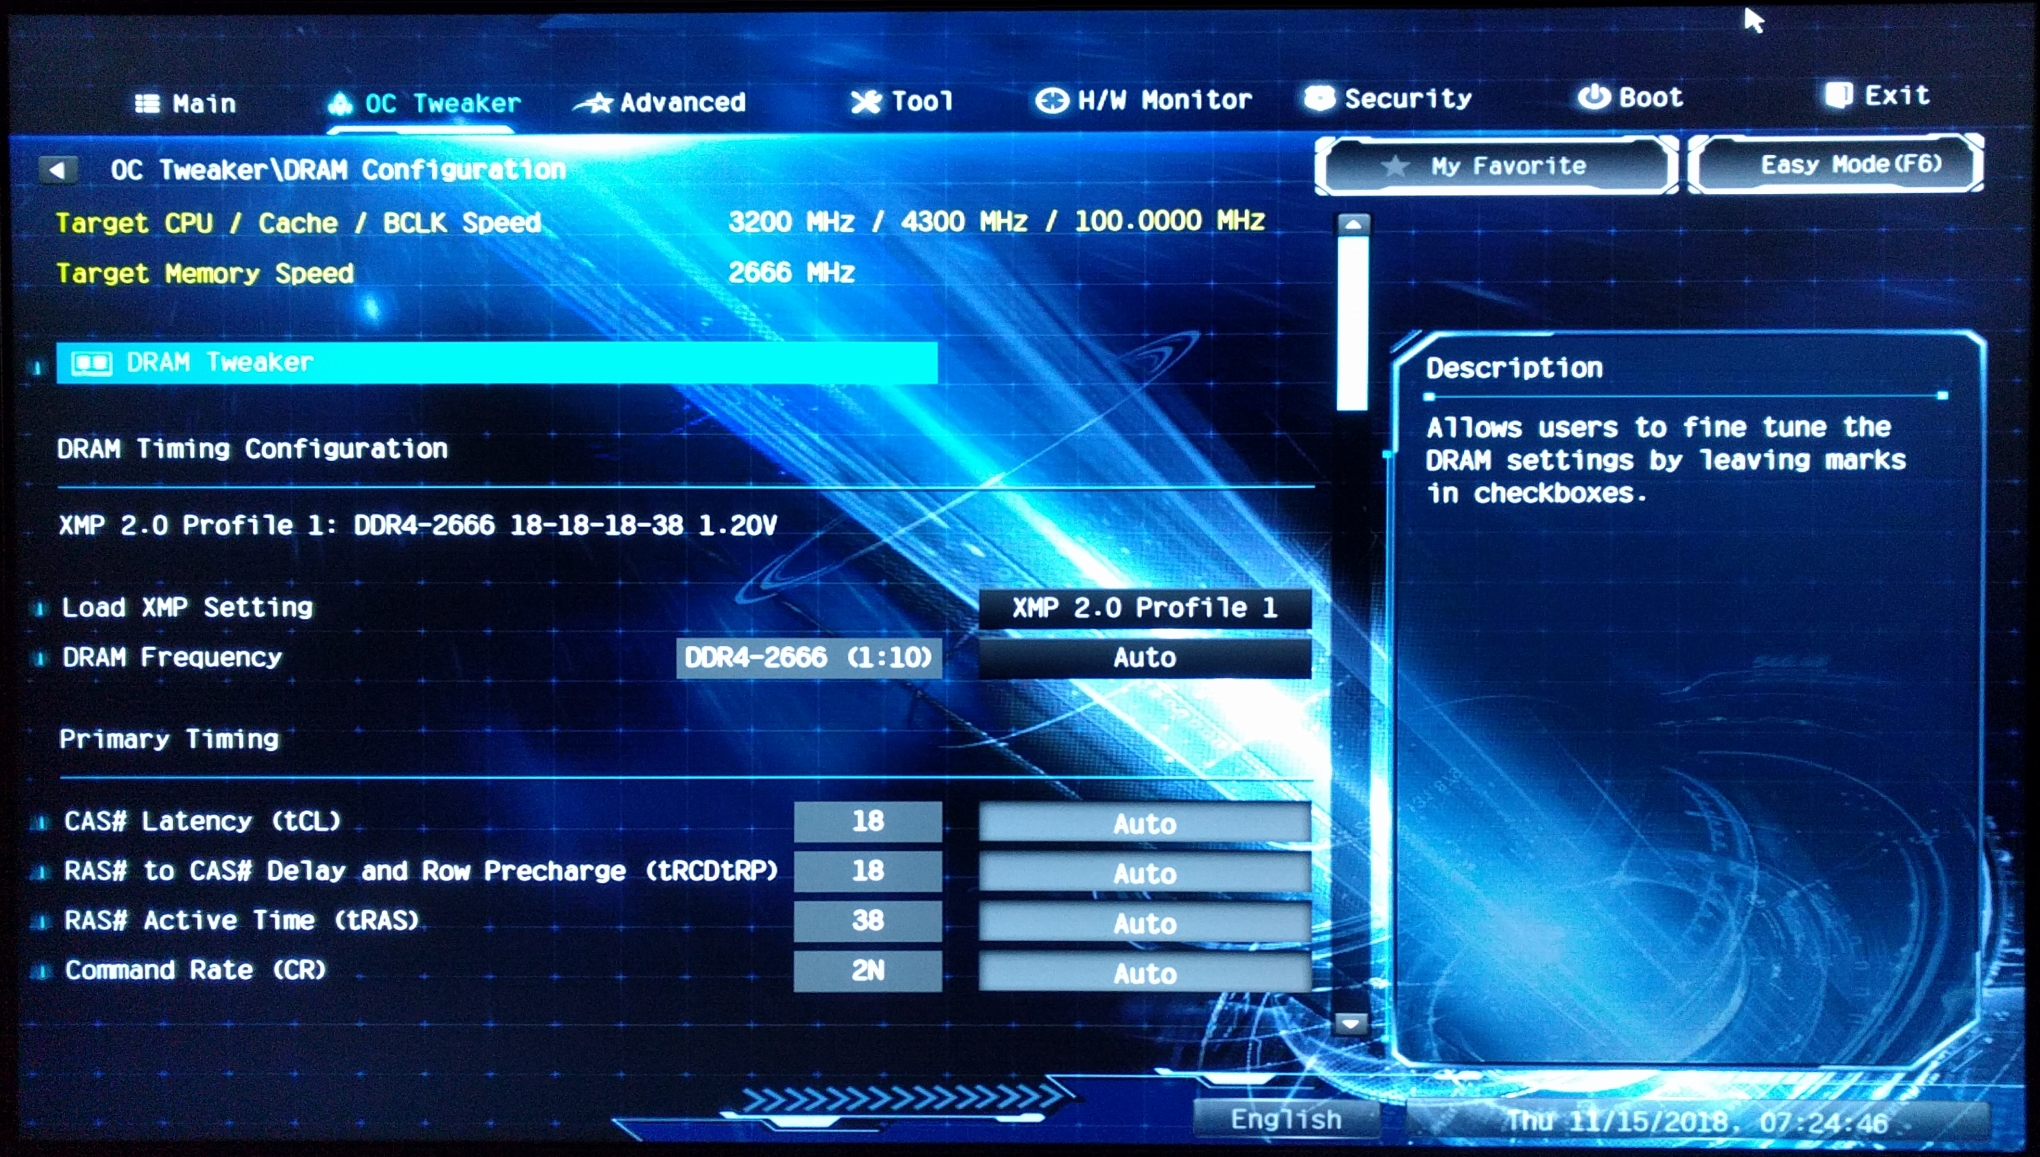 DRAM Options for the ASRock DeskMini GTX (Z370) - Memory